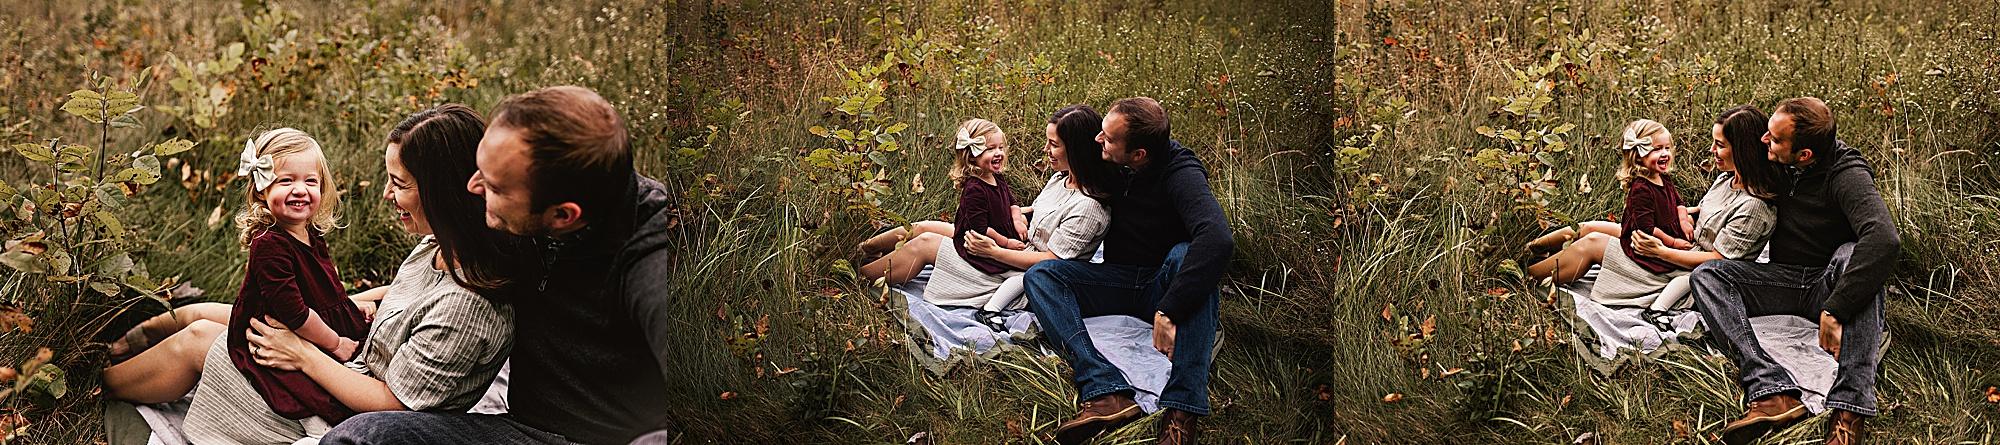 lauren-grayson-photography-akron-ohio-maternity-session-fall-hammer_0046.jpg